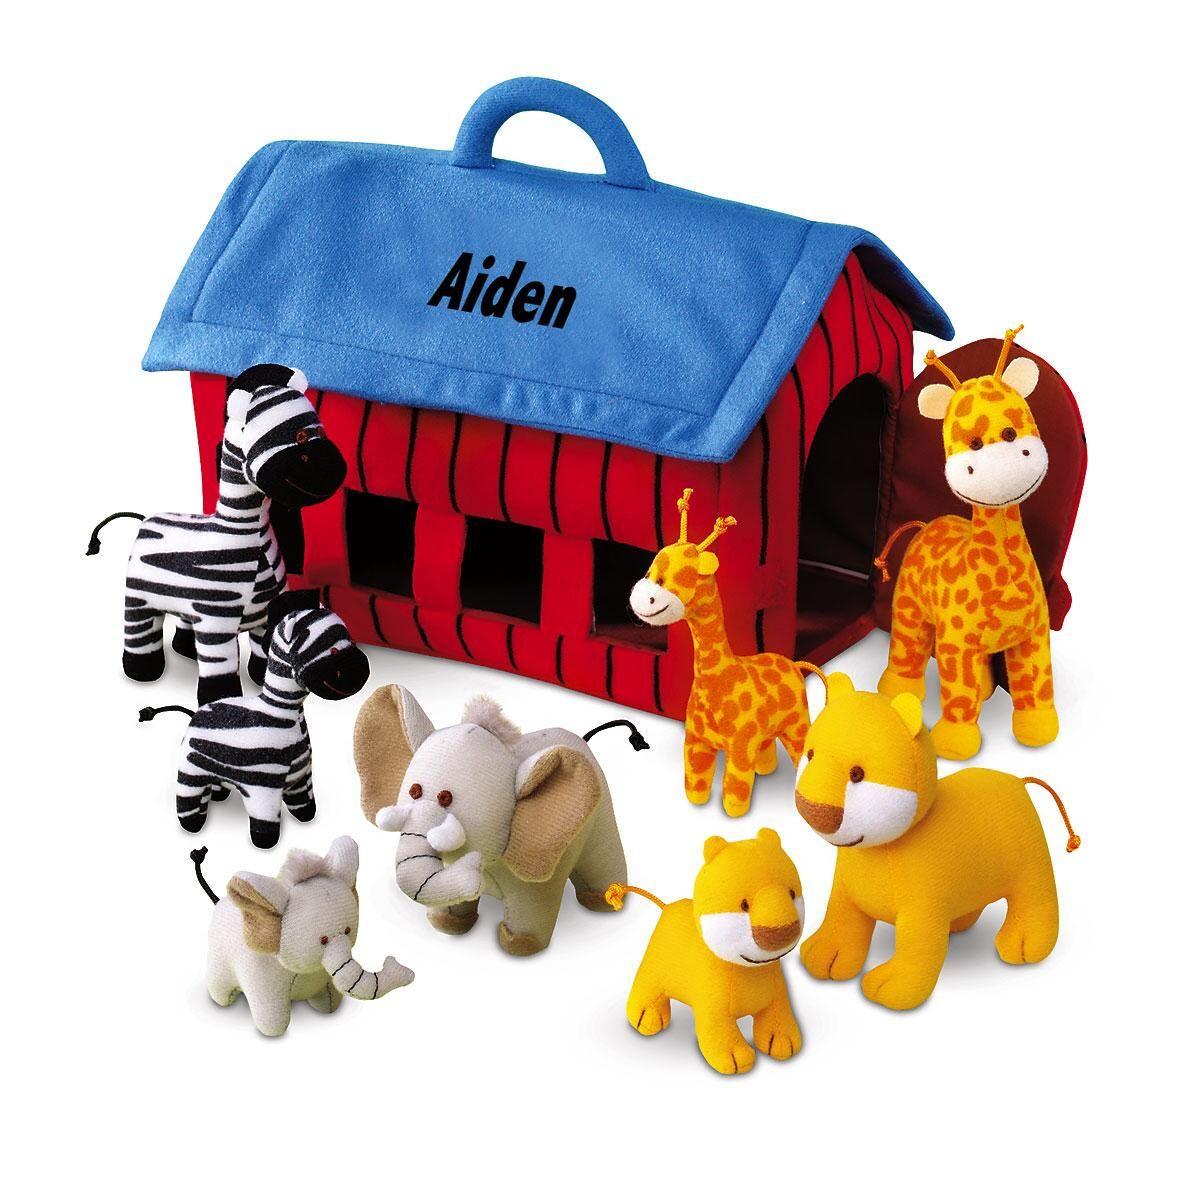 Personalized Plush Zoo Animals Play Set